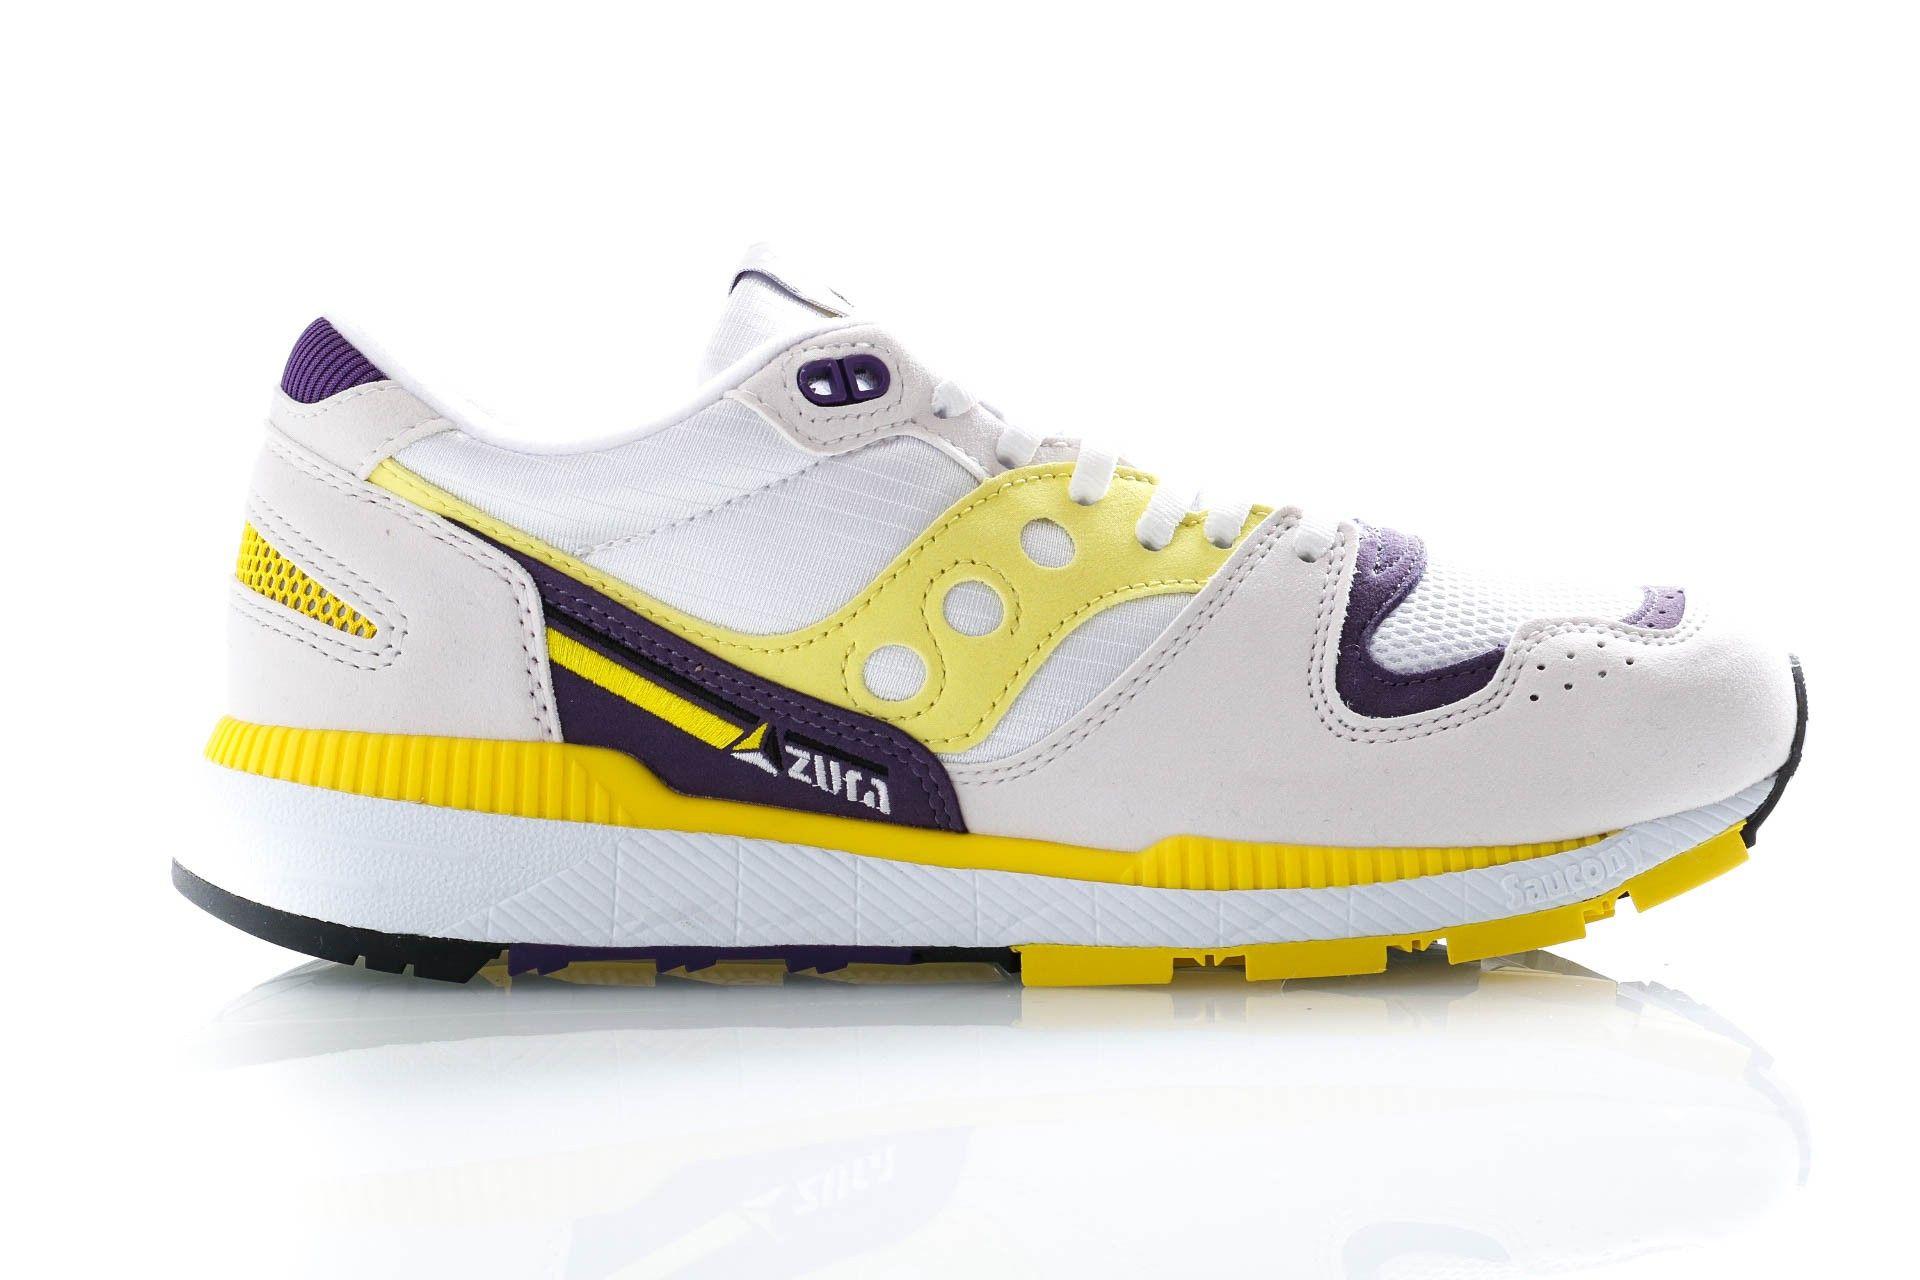 Afbeelding van Saucony Sneakers Azura White/Blazing Yellow/Indigo S70437-34